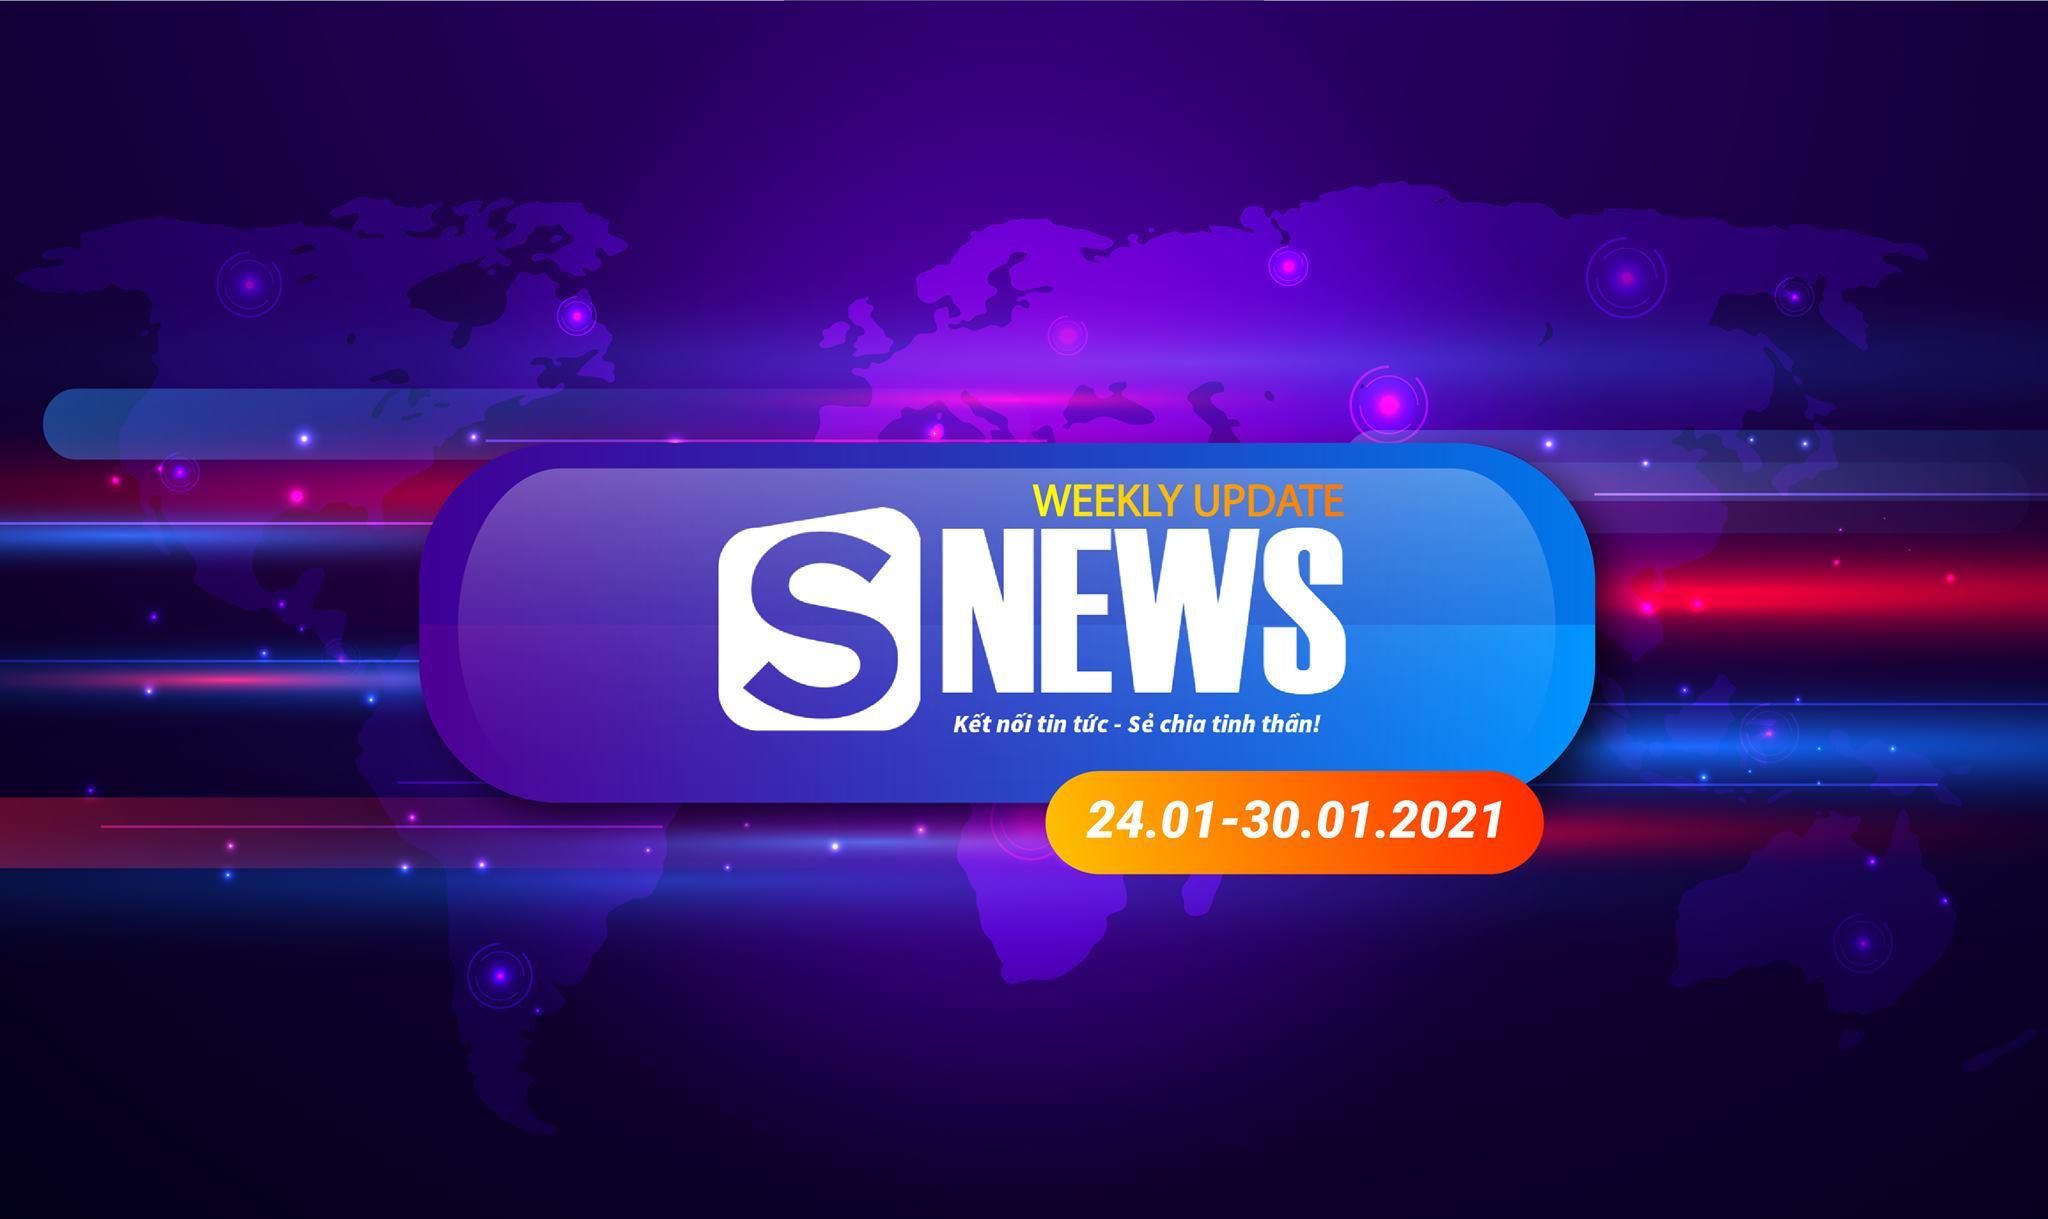 Tổng hợp tin tức Sapo tuần qua: 24.01 - 30.01.2020